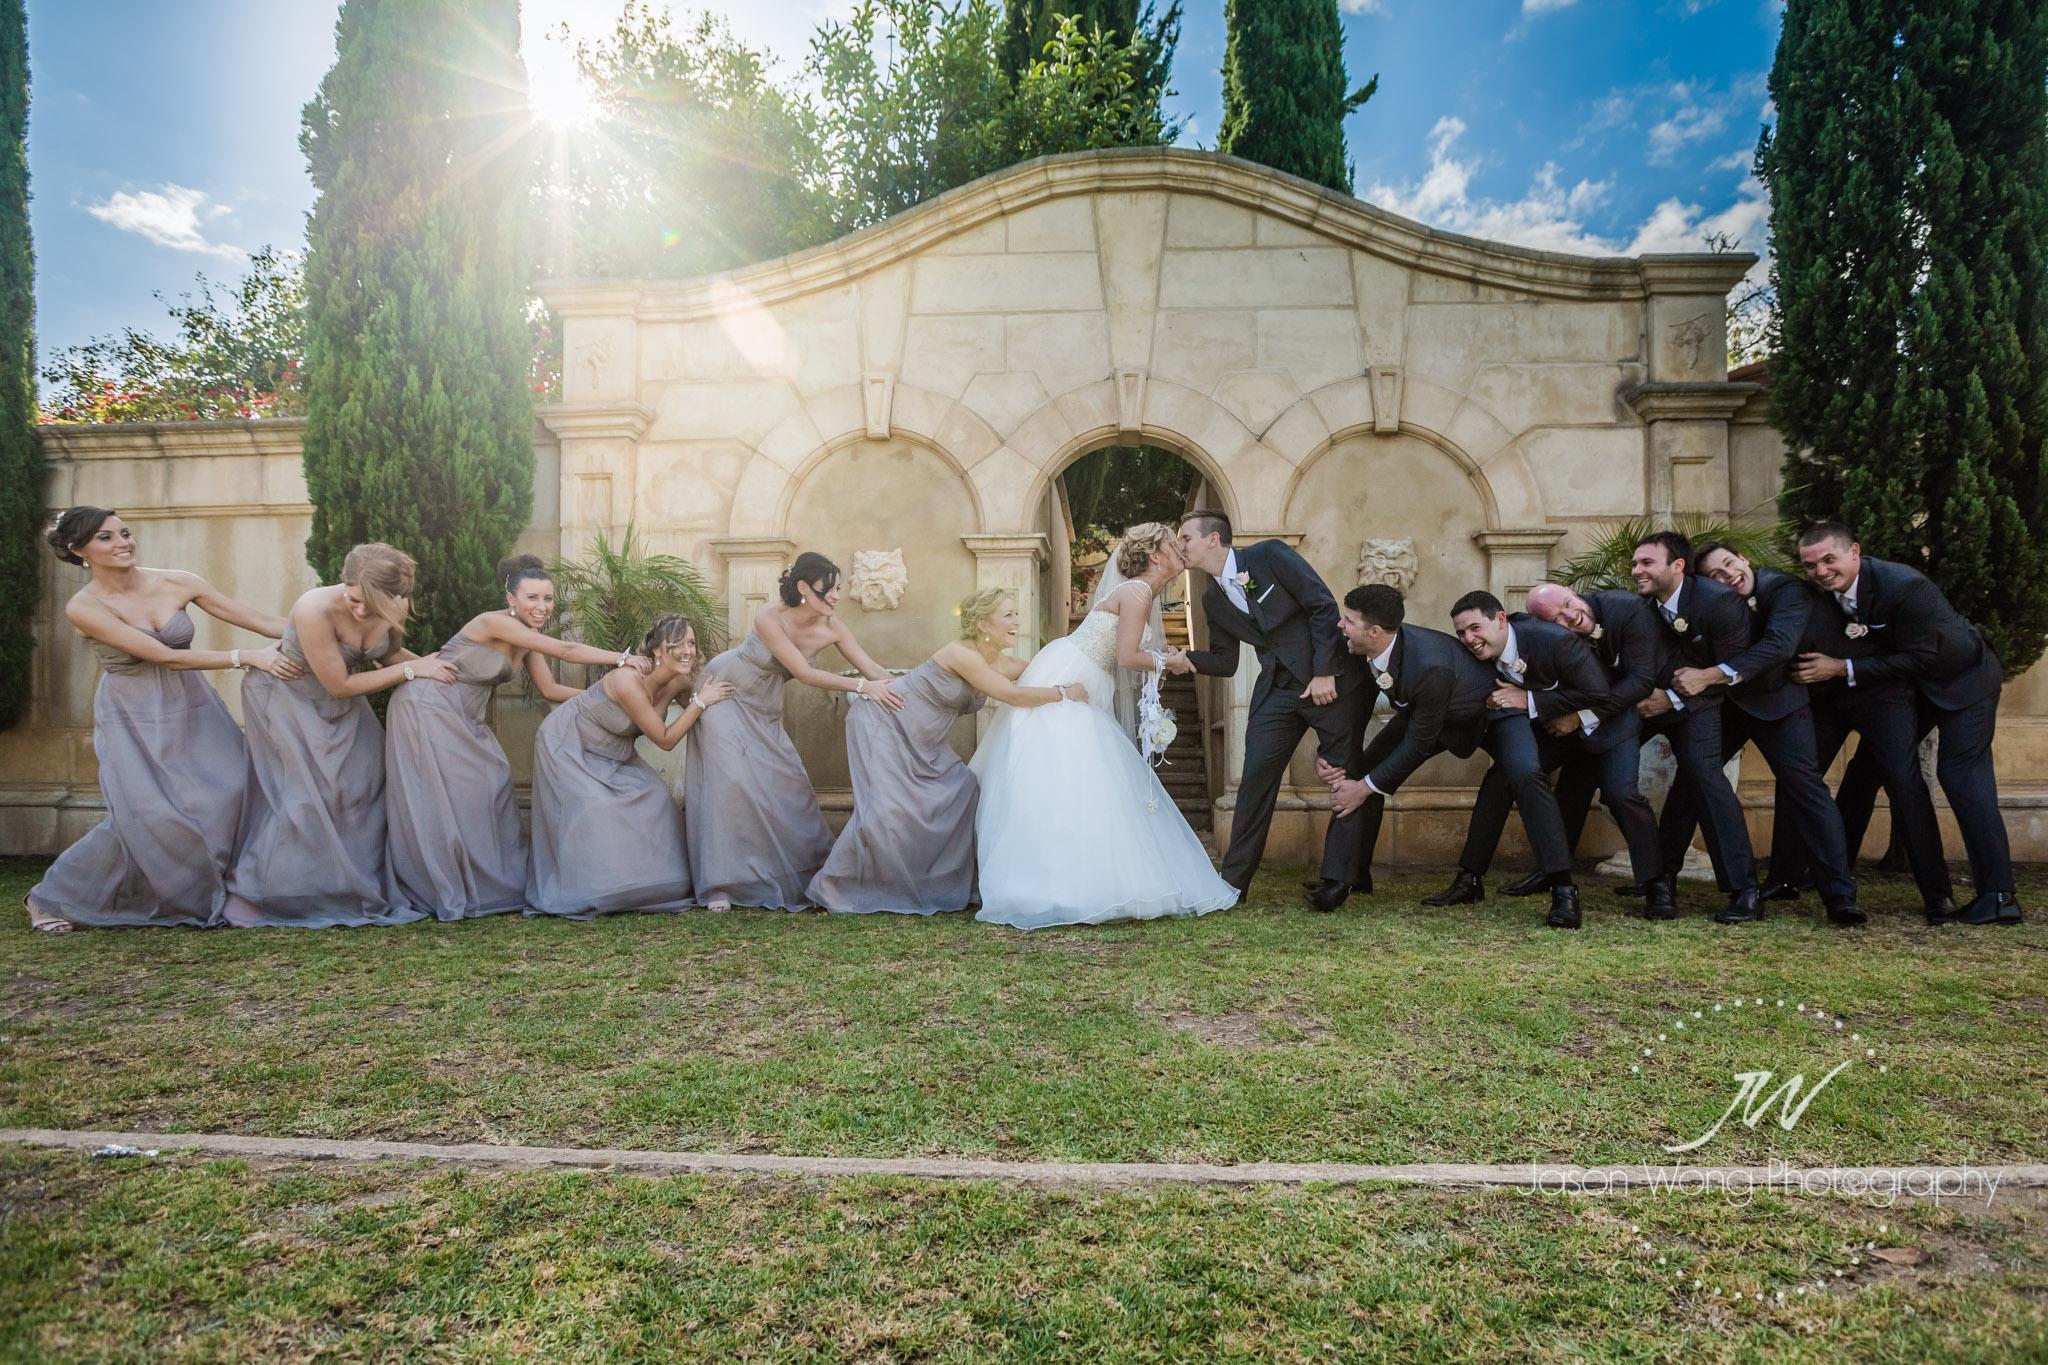 tug-o-wall-for-bride-and-groom-jason-wong-photography-style.jpg